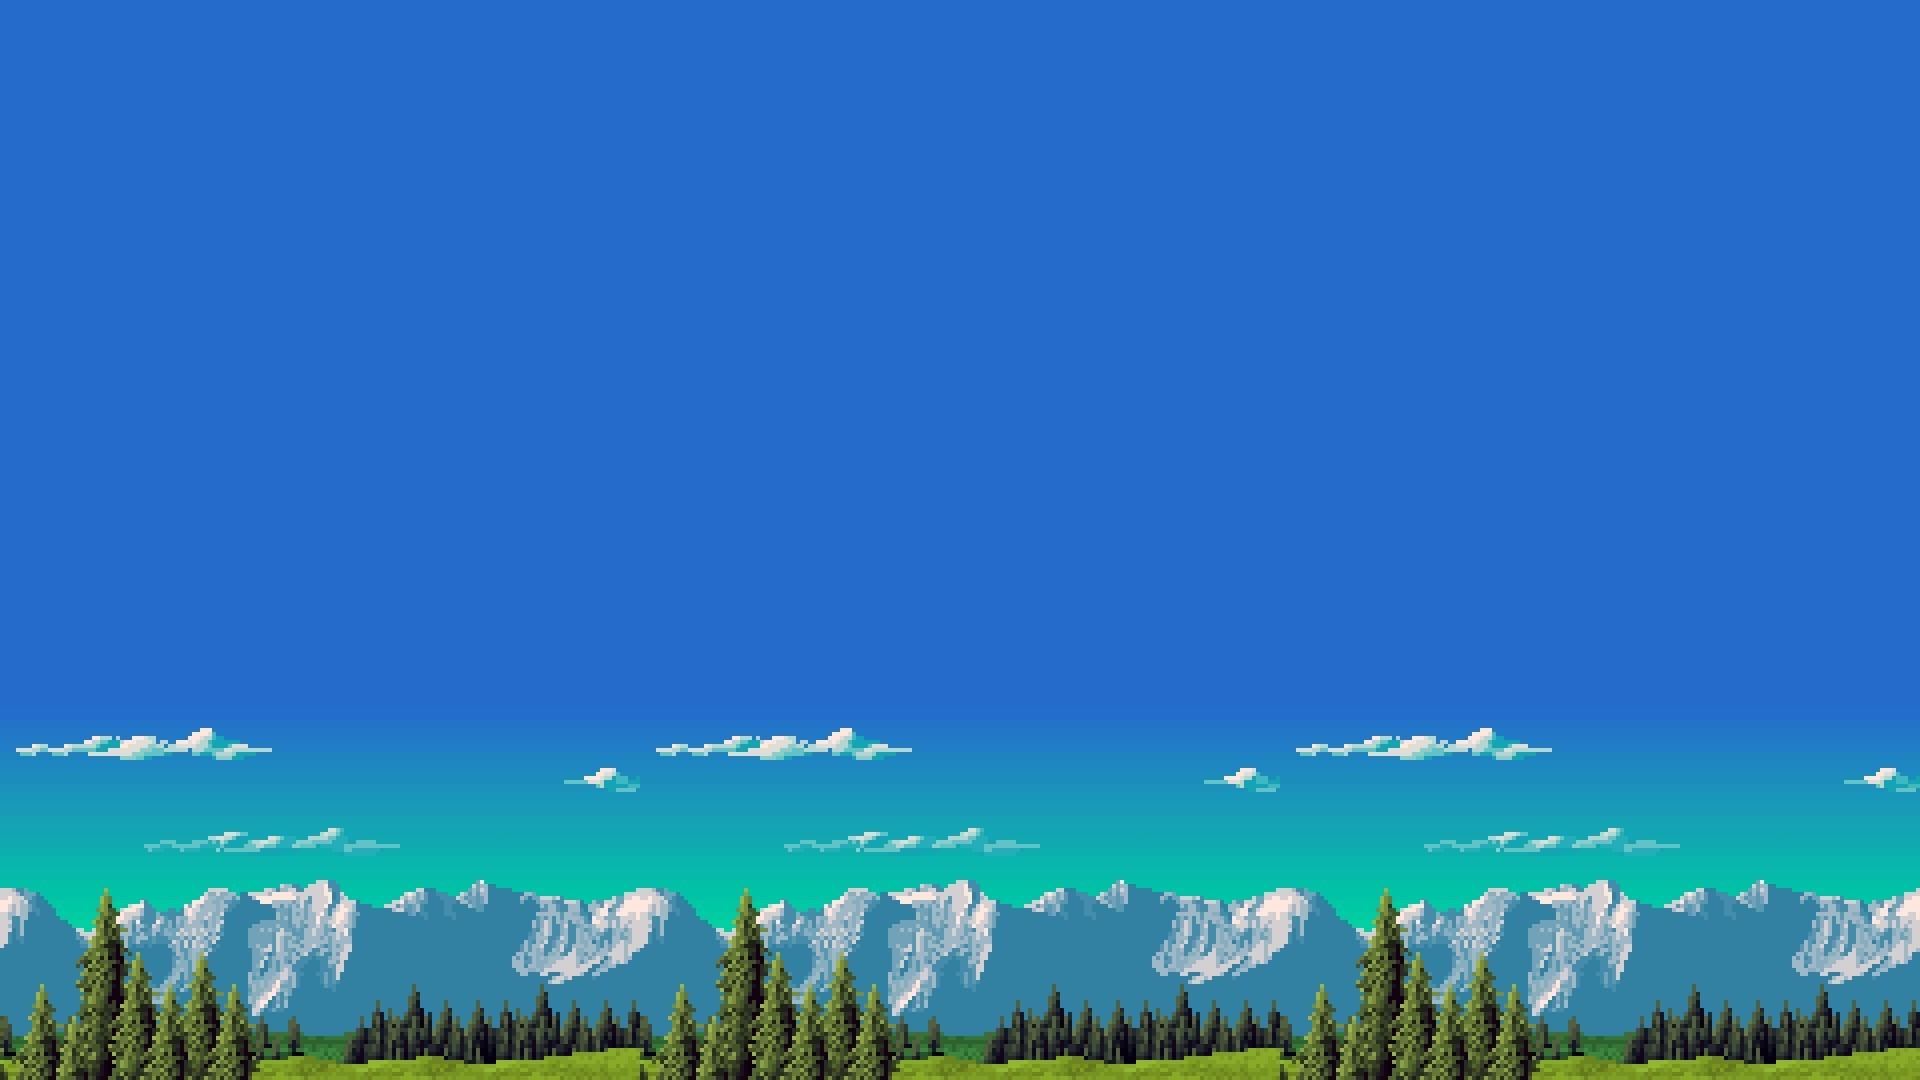 retro Games, Mountain, 8 bit Wallpapers HD / Desktop and Mobile #8246